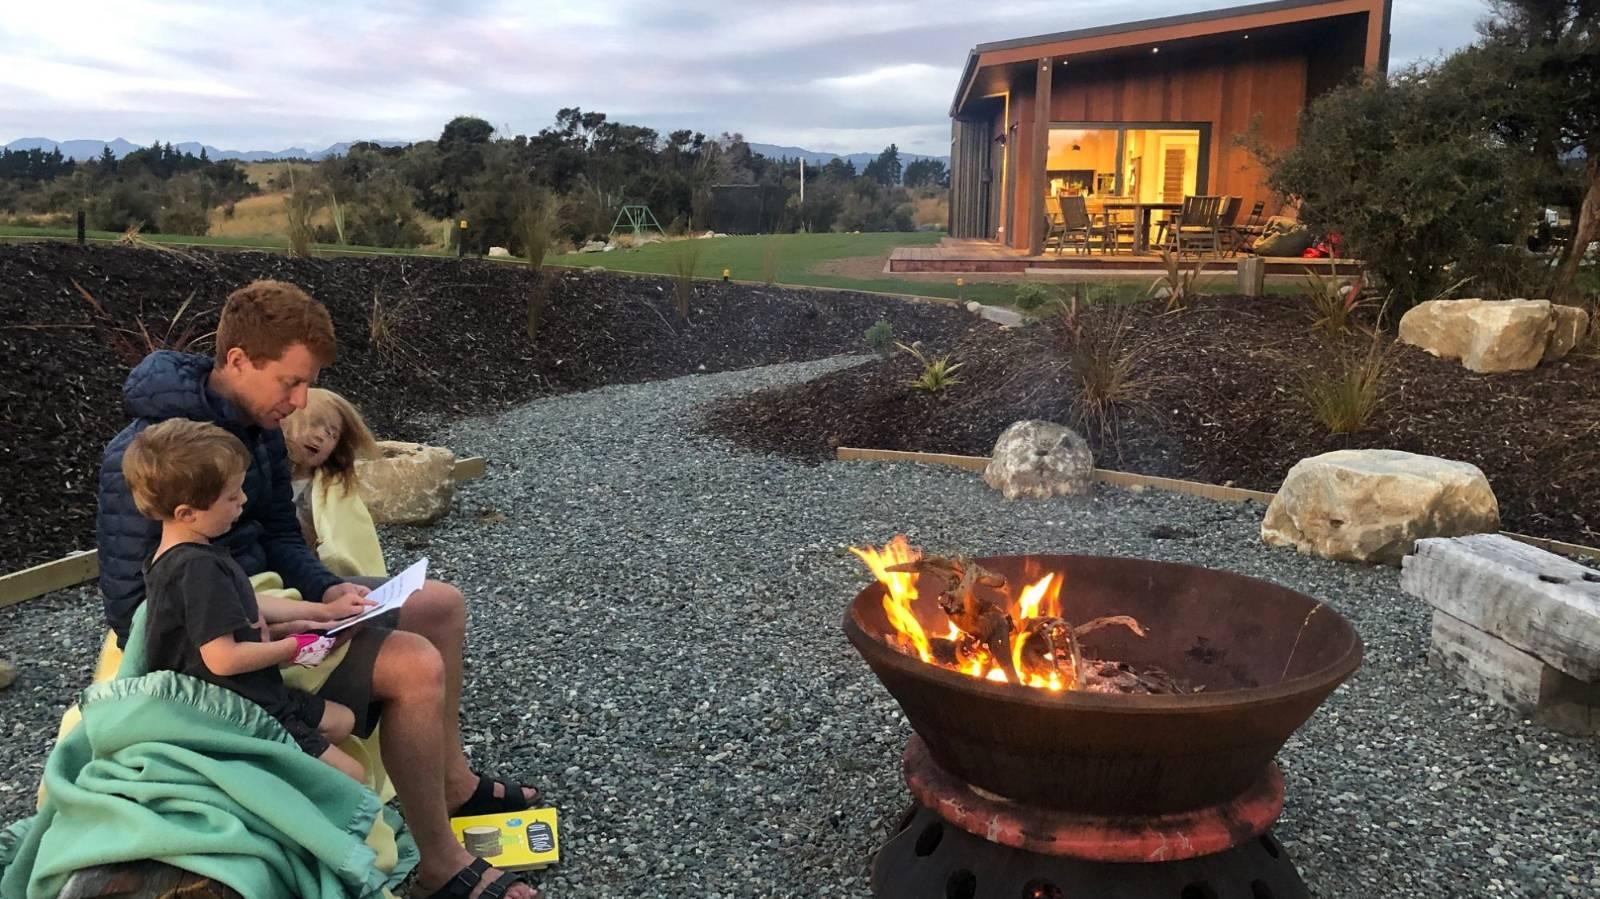 My Green Home: Te Anau family found their 'sweet spot'